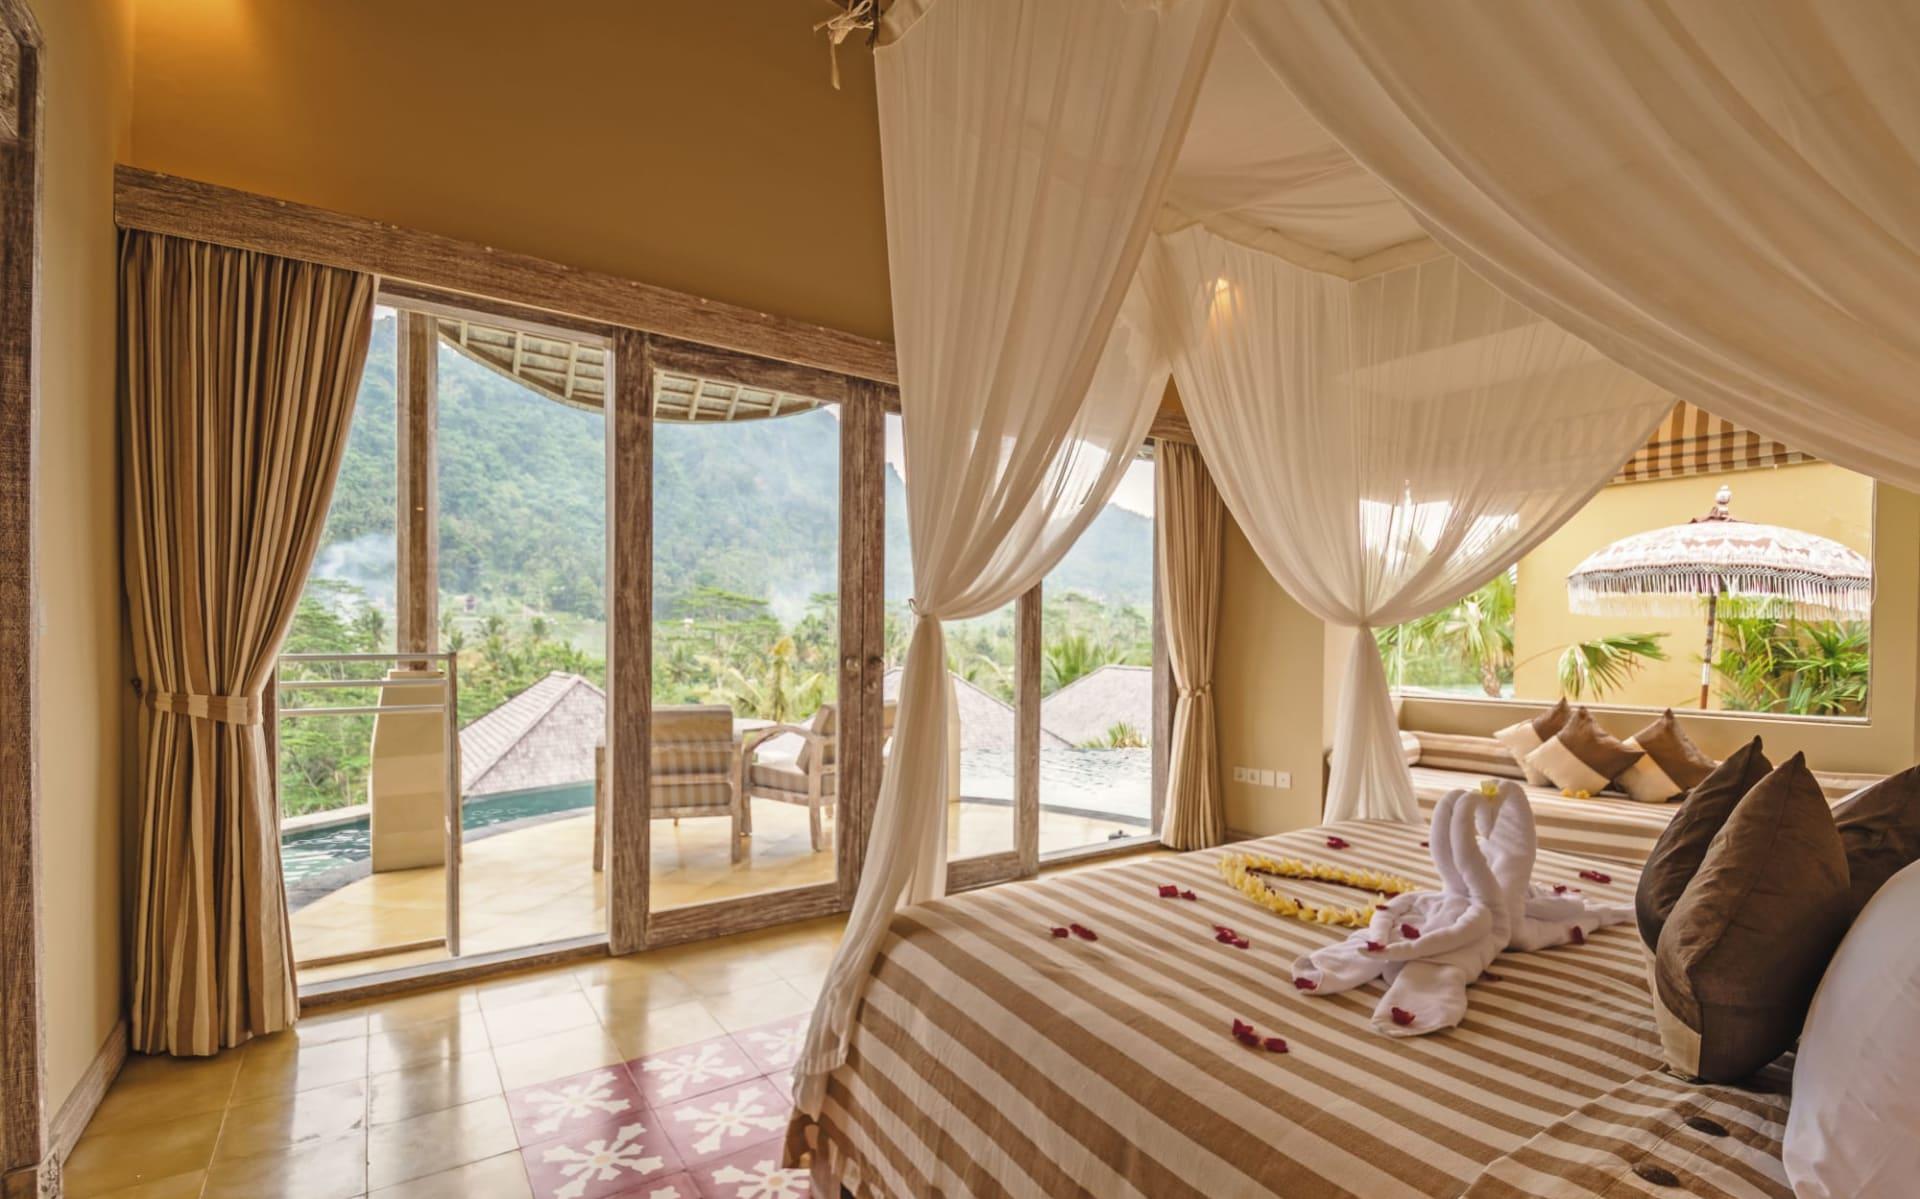 Wapa di Ume Sidemen in Ostbali: 1-Bedroom Pool Villa